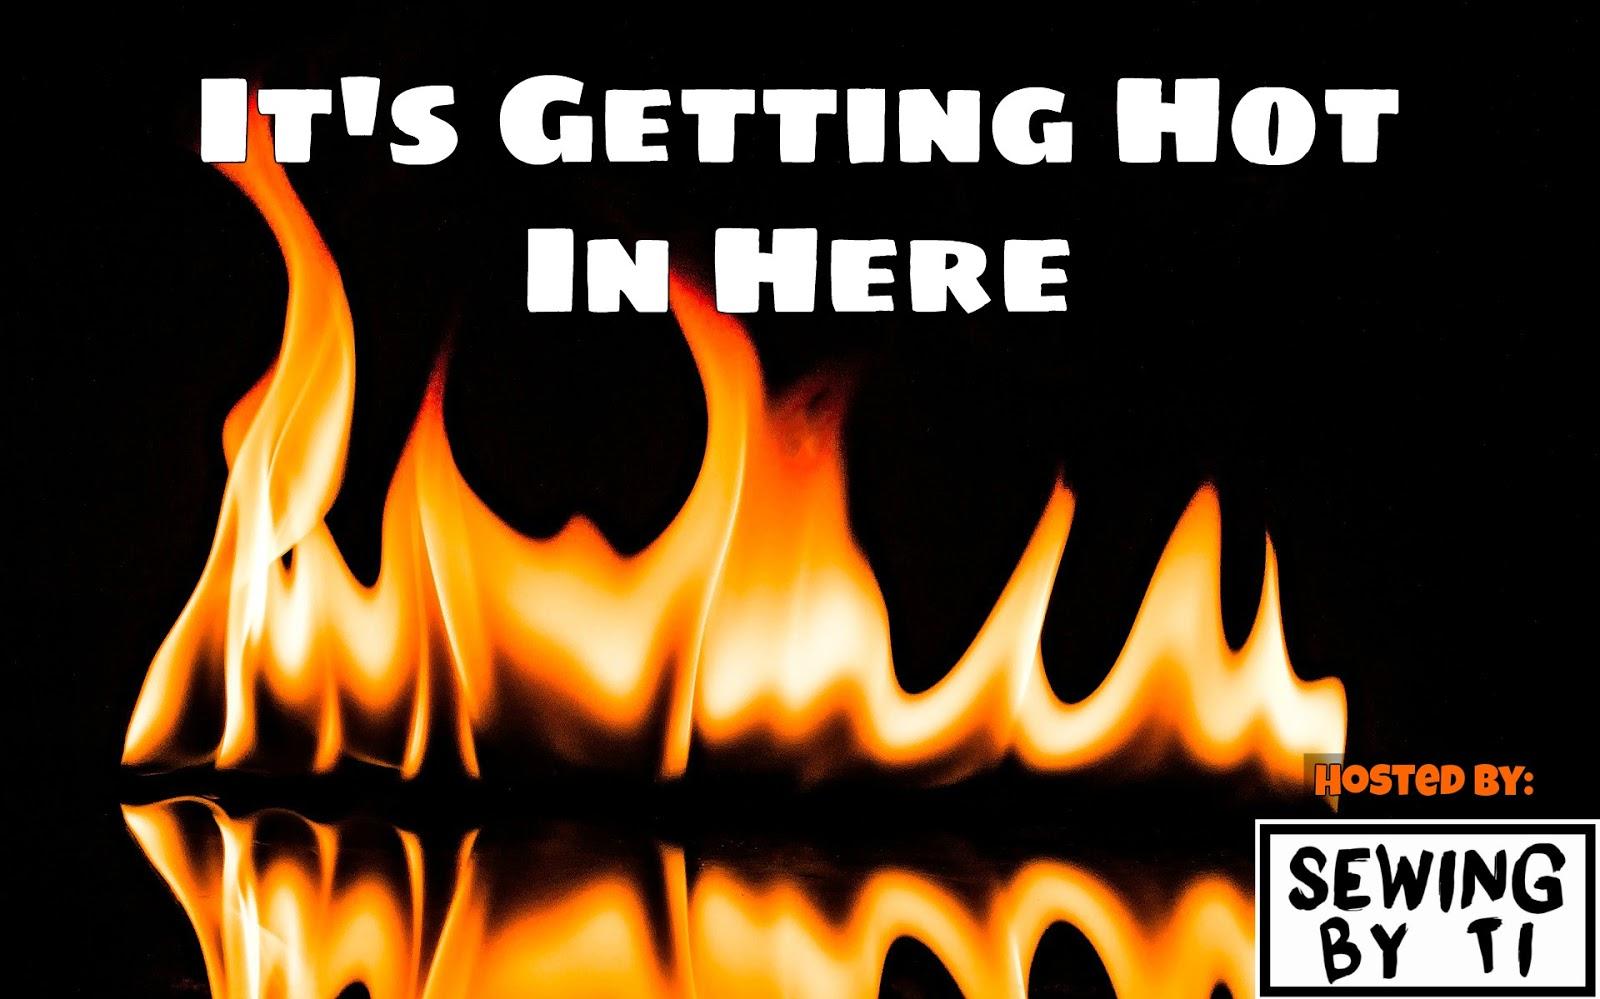 Getting it hot